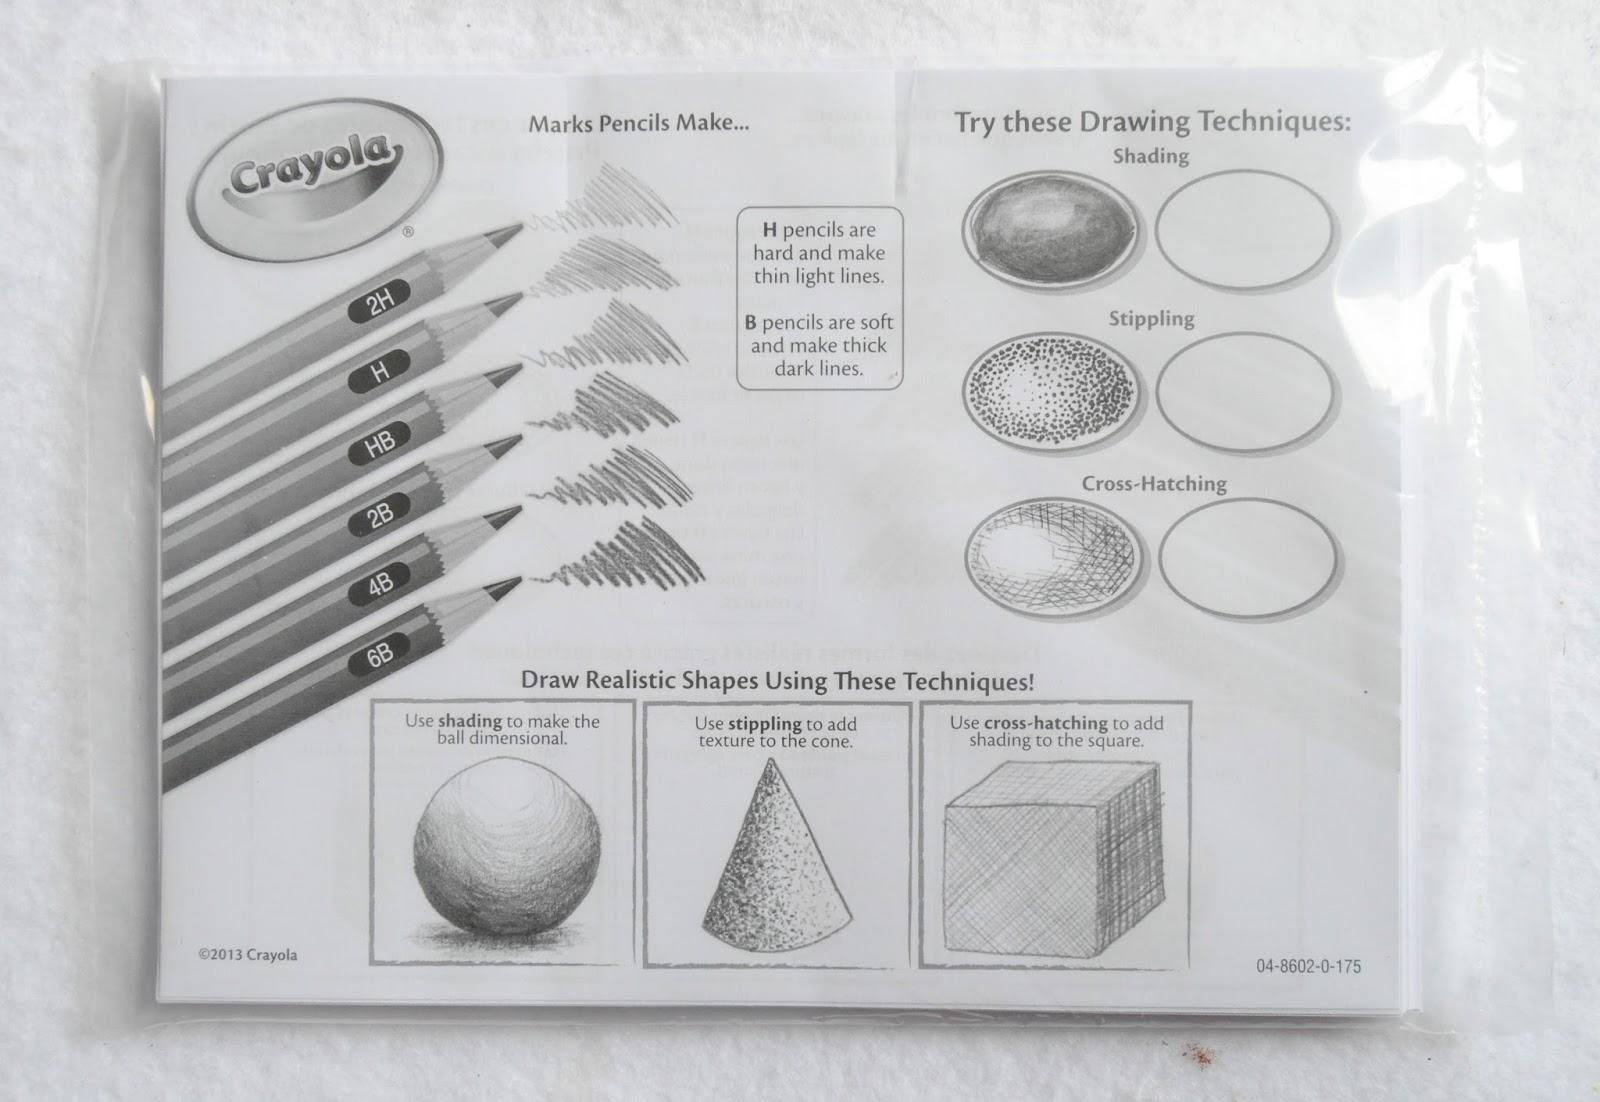 65 Piece Crayola Pencils Set With Graphite Pencils Whats Inside